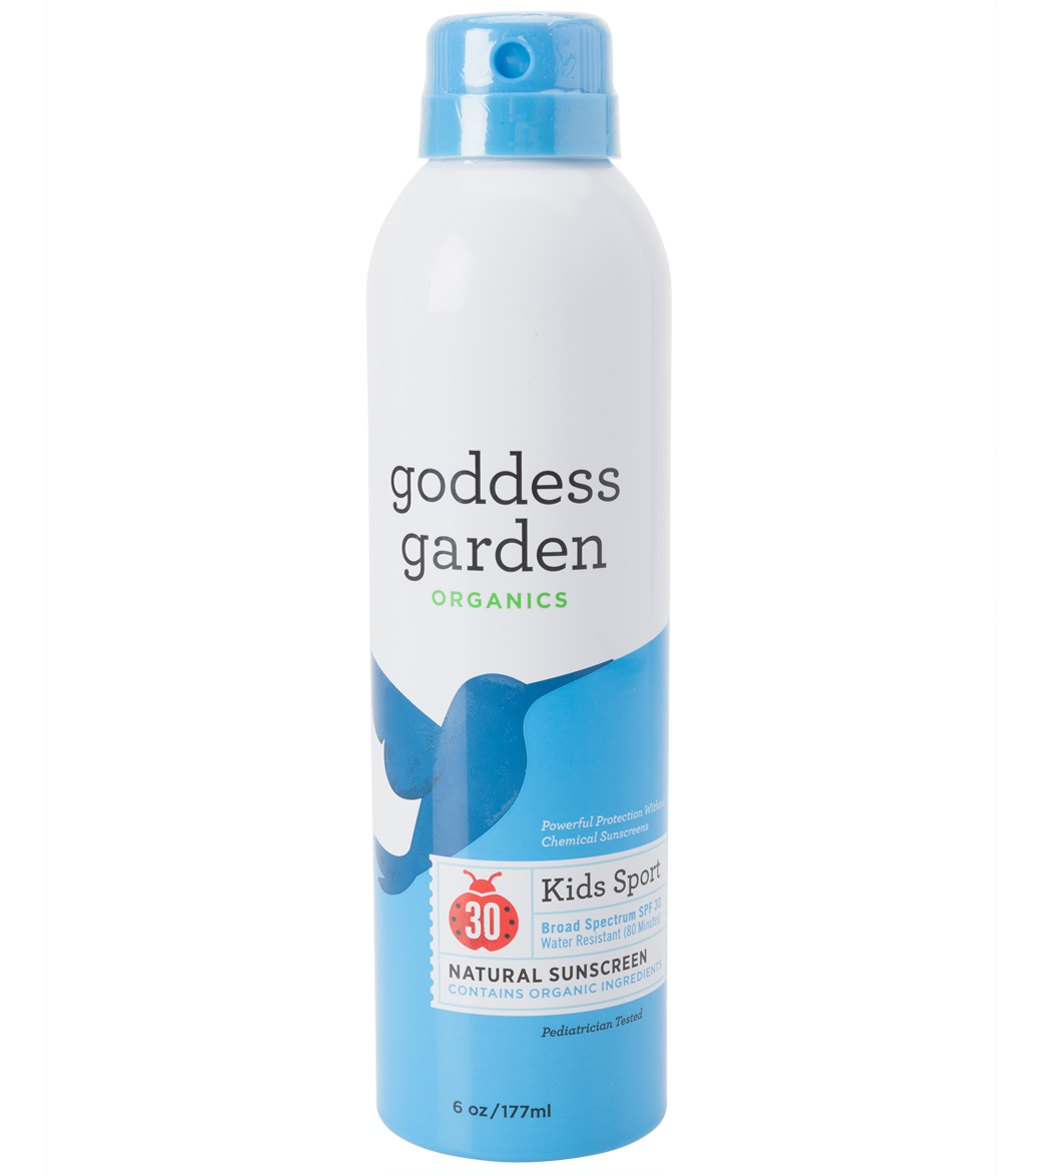 Goddess Garden Kid 39 S Sport Organic Spf 30 Continuous Spray 6 Oz At